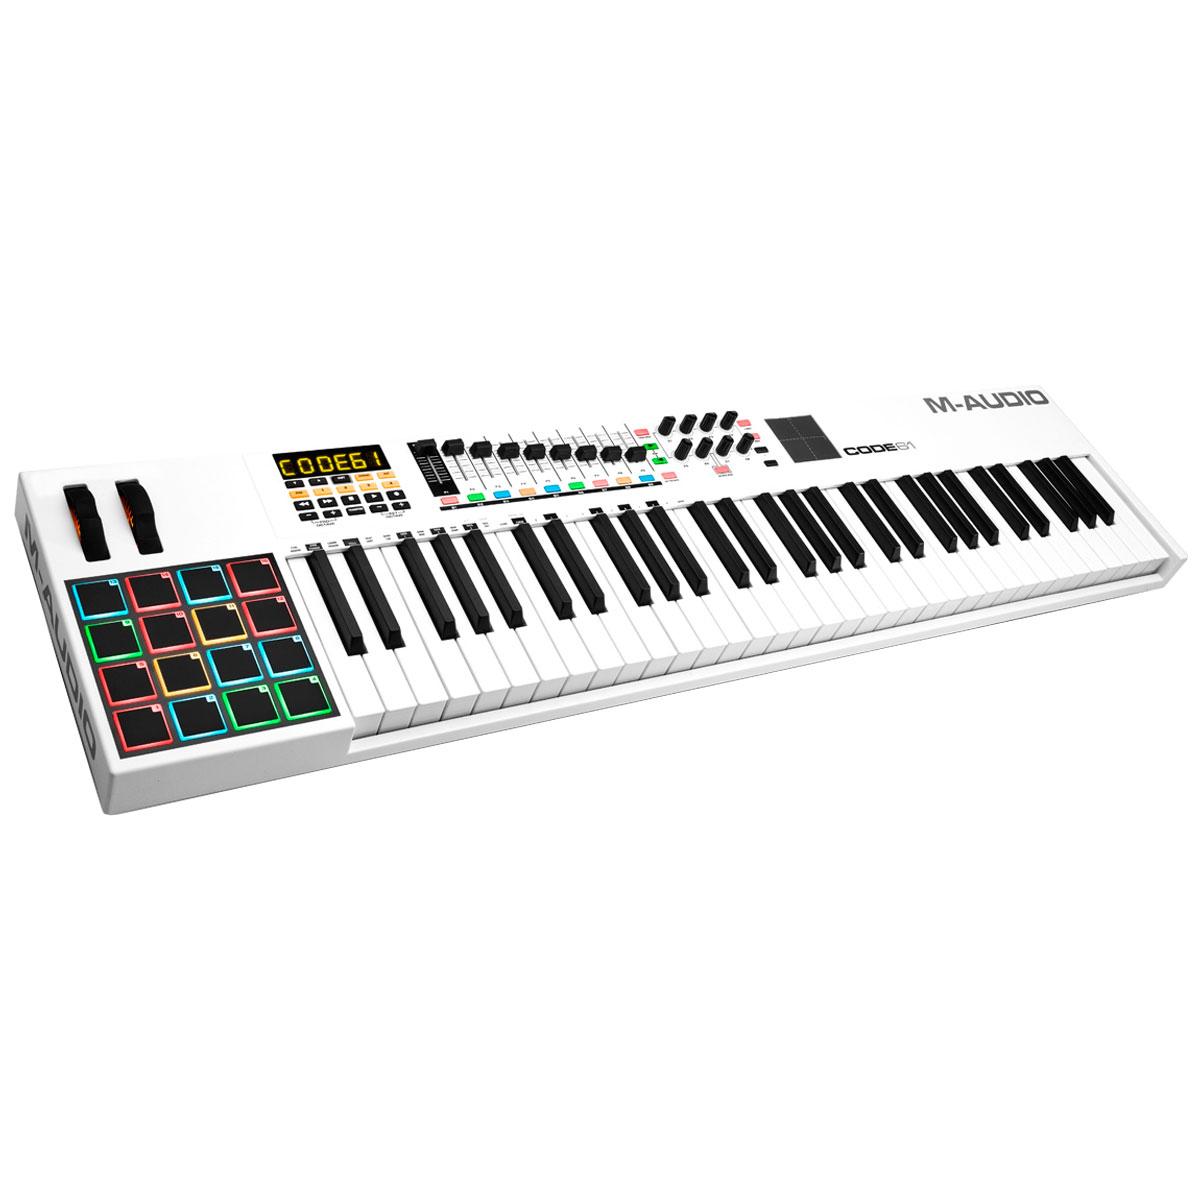 Code61 - Teclado Controlador MIDI / USB Code 61 - M-Audio